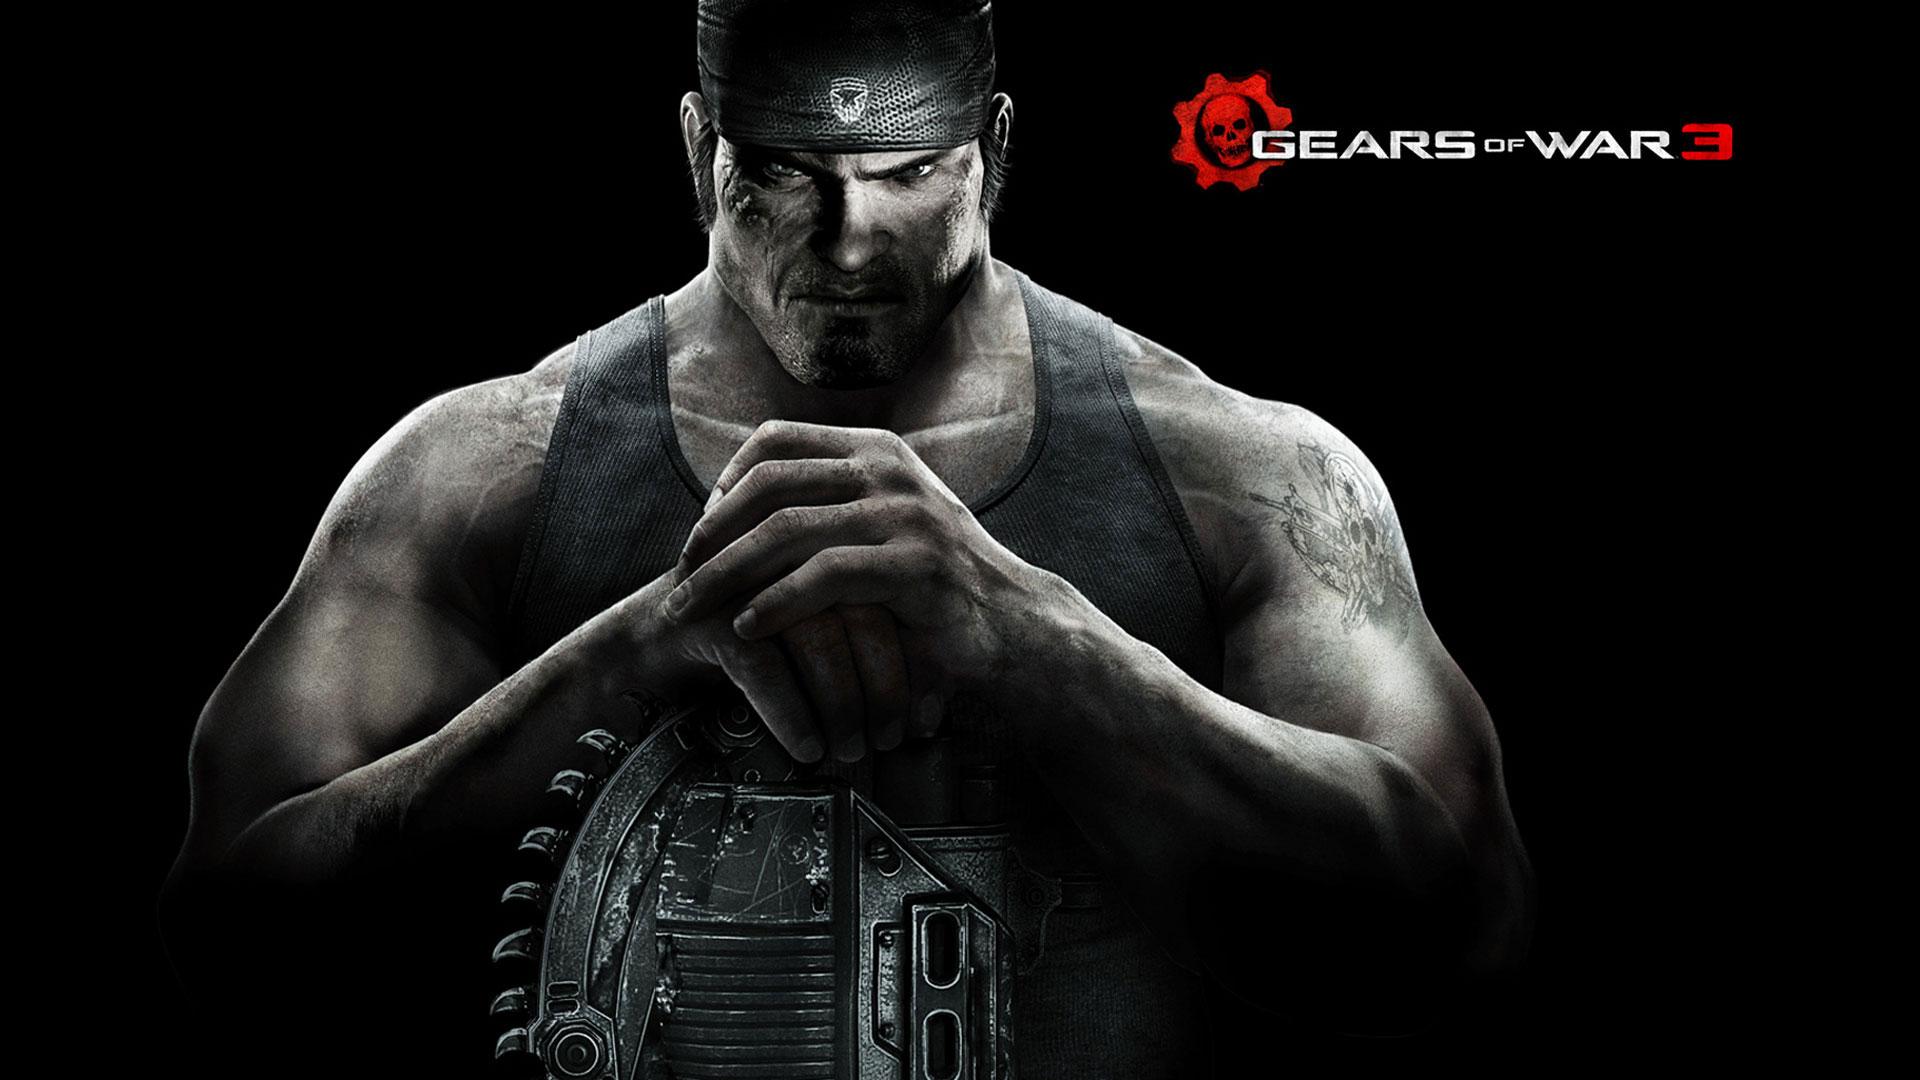 Gears of War 3 1080p Wallpaper Gears of War 3 720p Wallpaper 1920x1080